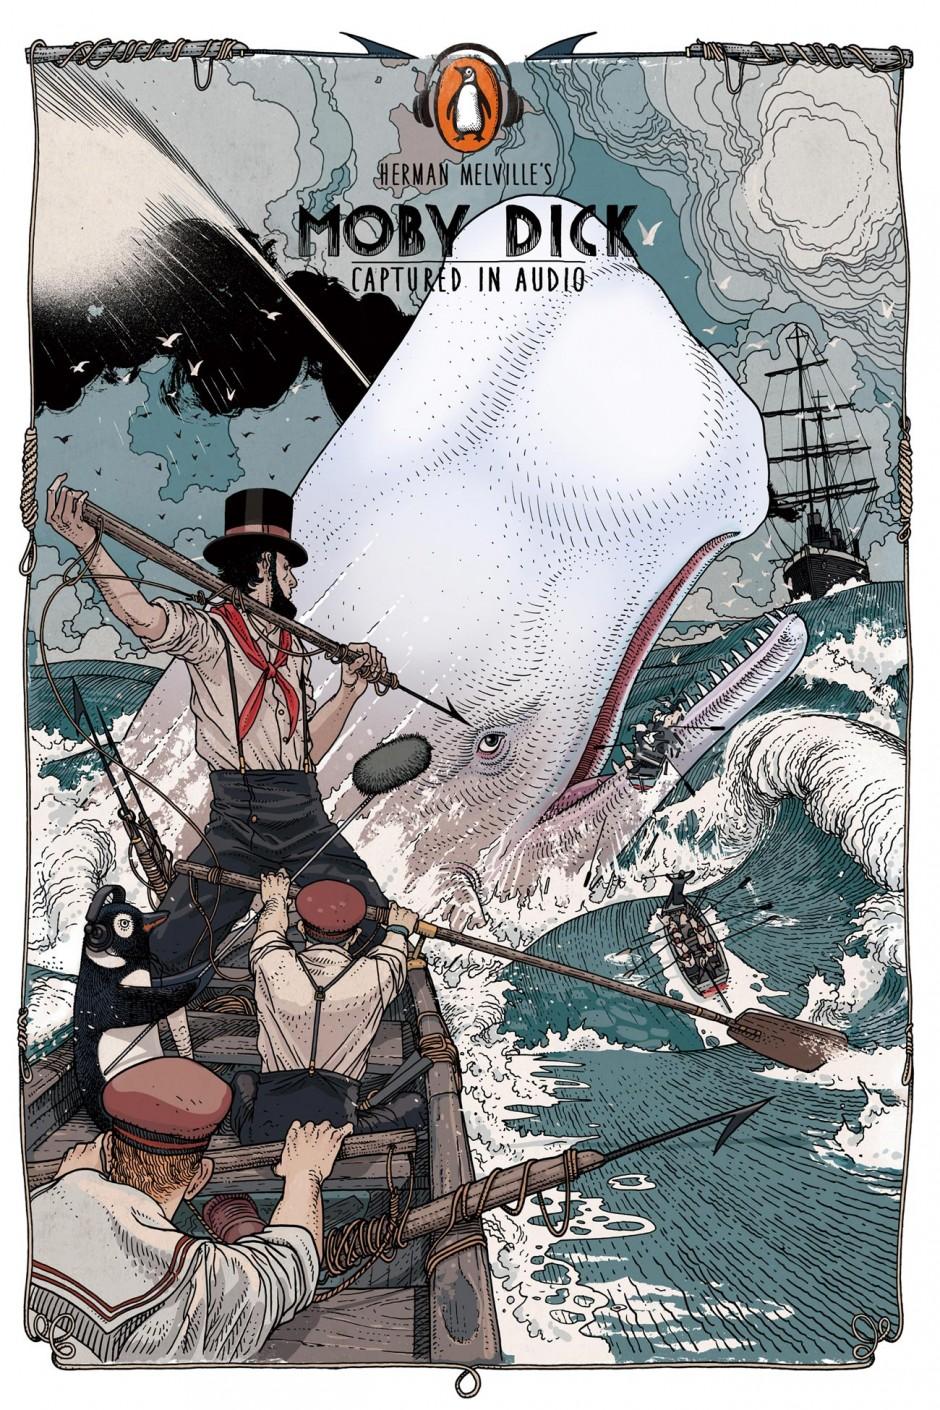 Moby Dick, 2013, China, Werbung für Penguin China, Audio Books, ausgezeichnet als Silver Lion Campaign, 2014